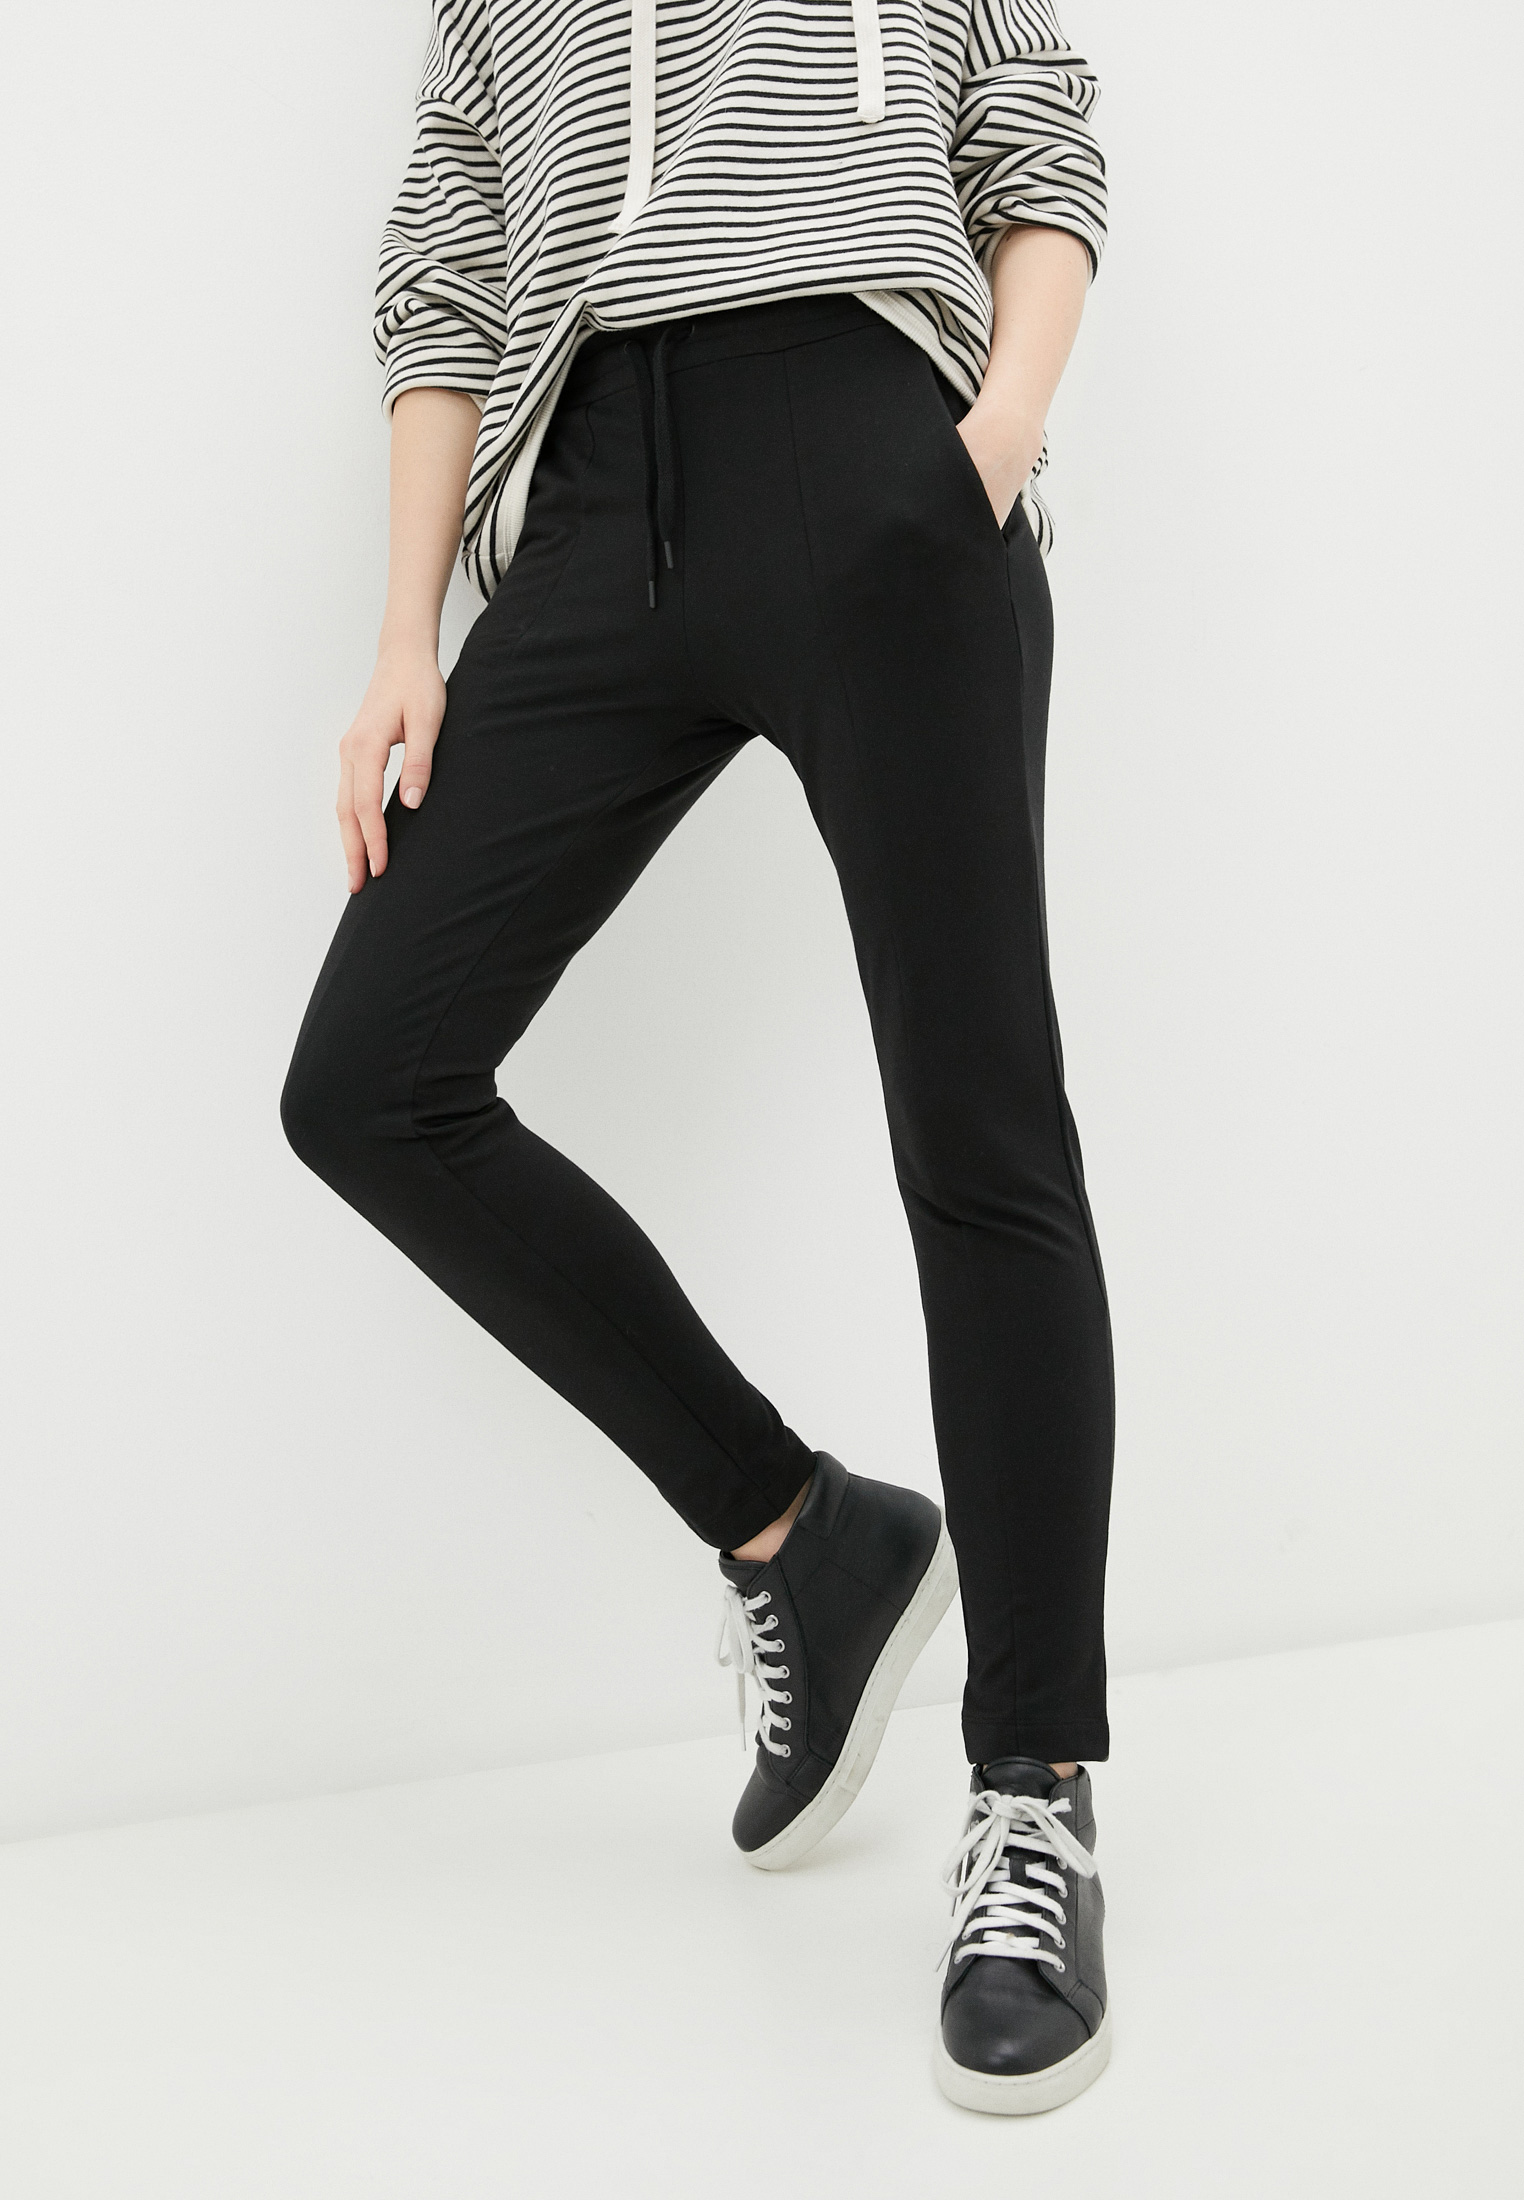 Женские спортивные брюки Love Moschino W 1 513 03 E 2180